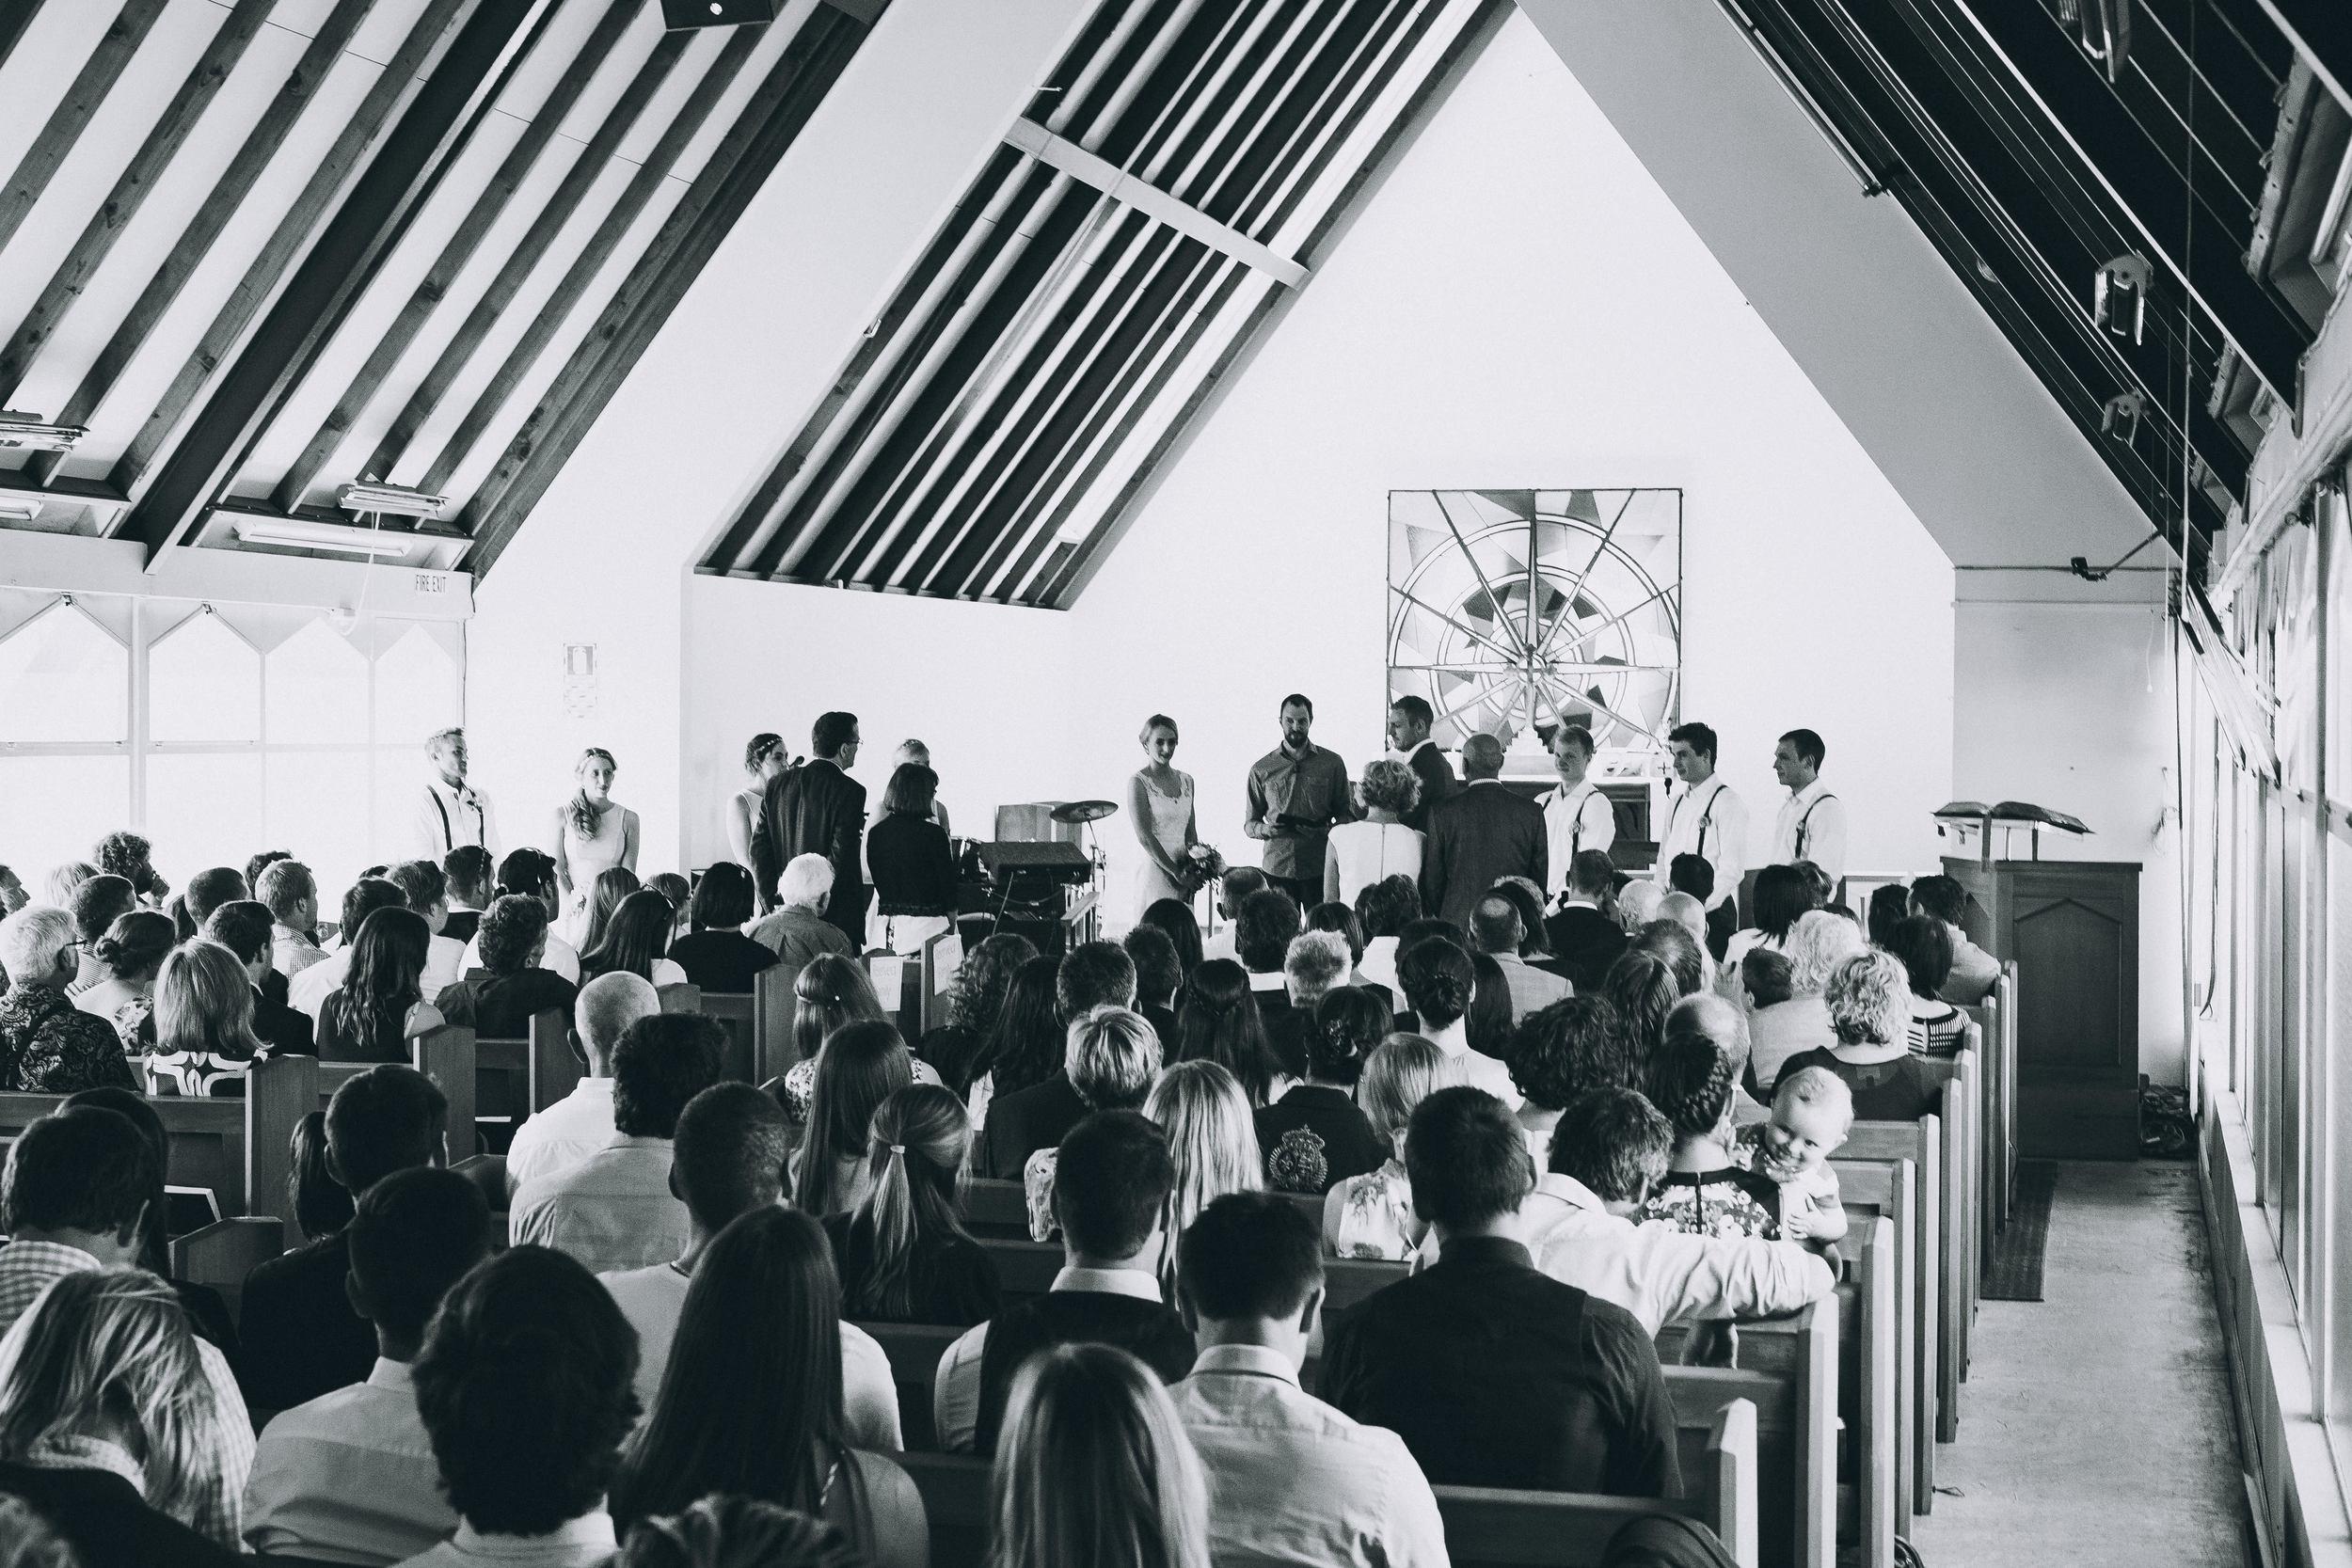 Shivonne & James - Ceremony Monochrome-106.jpg